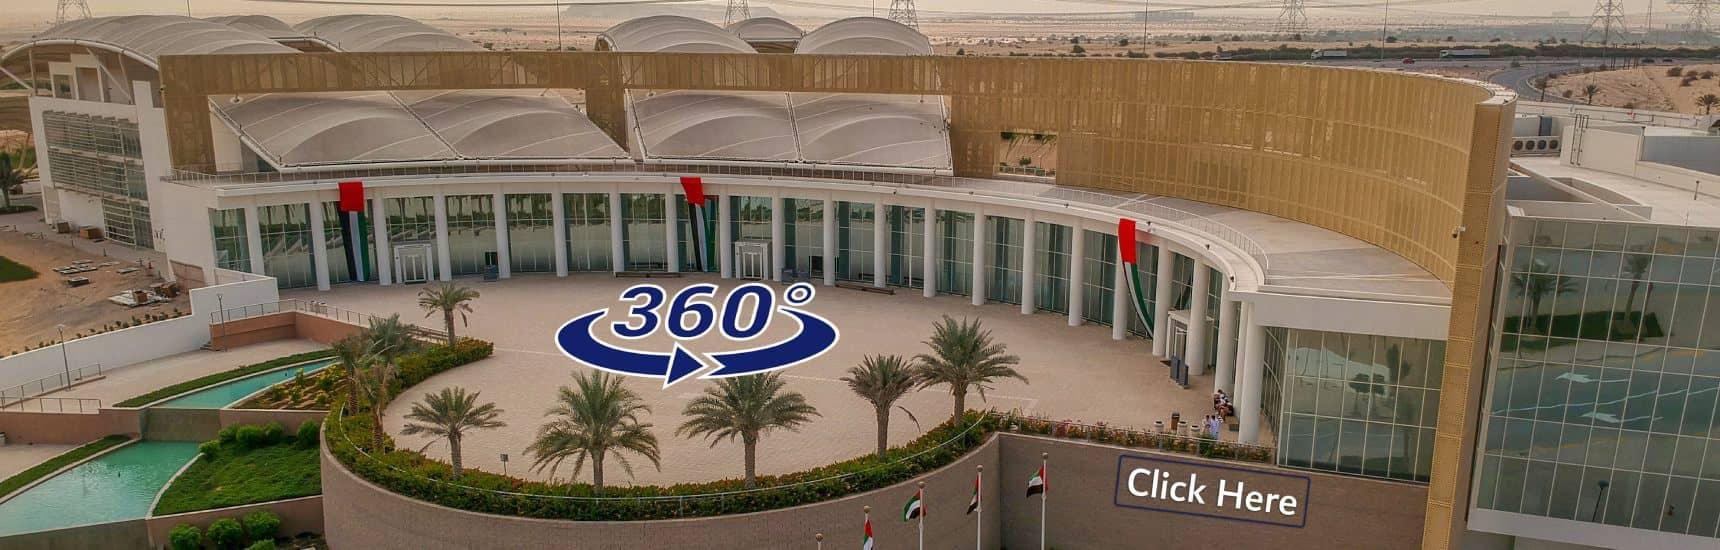 University in Dubai   University in UAE - University of